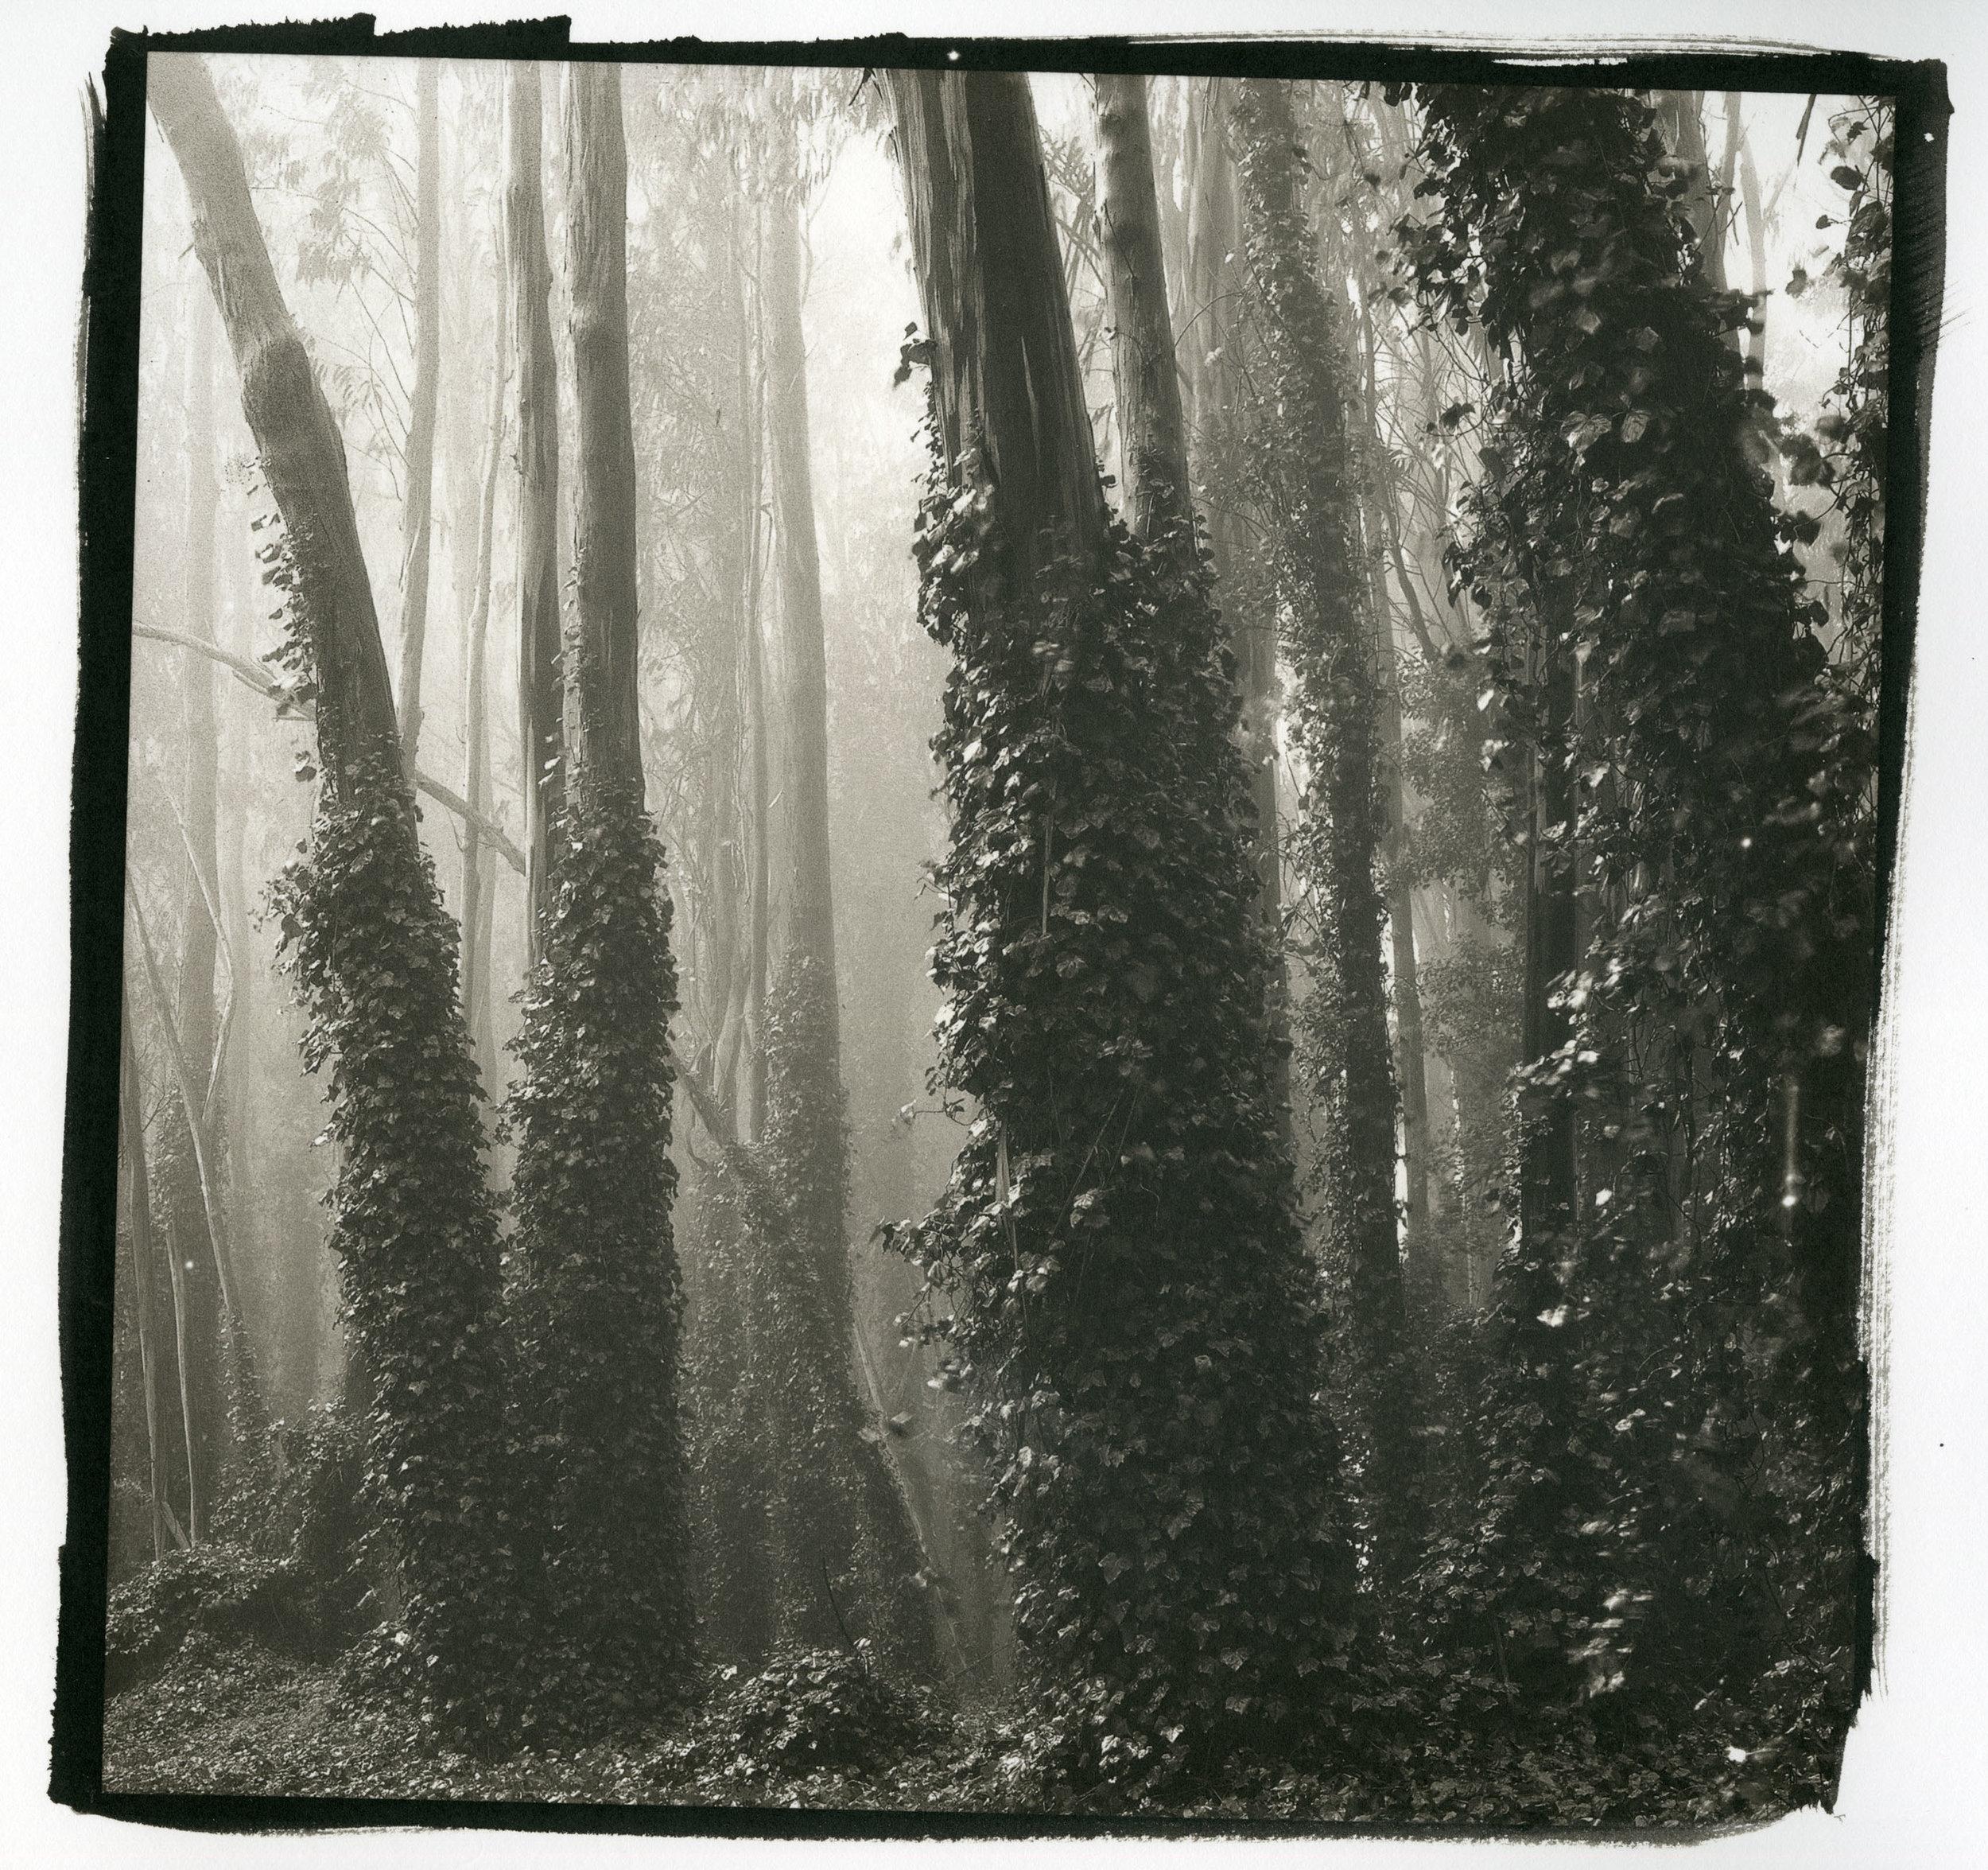 "Trees and Ivy No.2 (Platinum/Palladium Print, 10"" x 10"")"